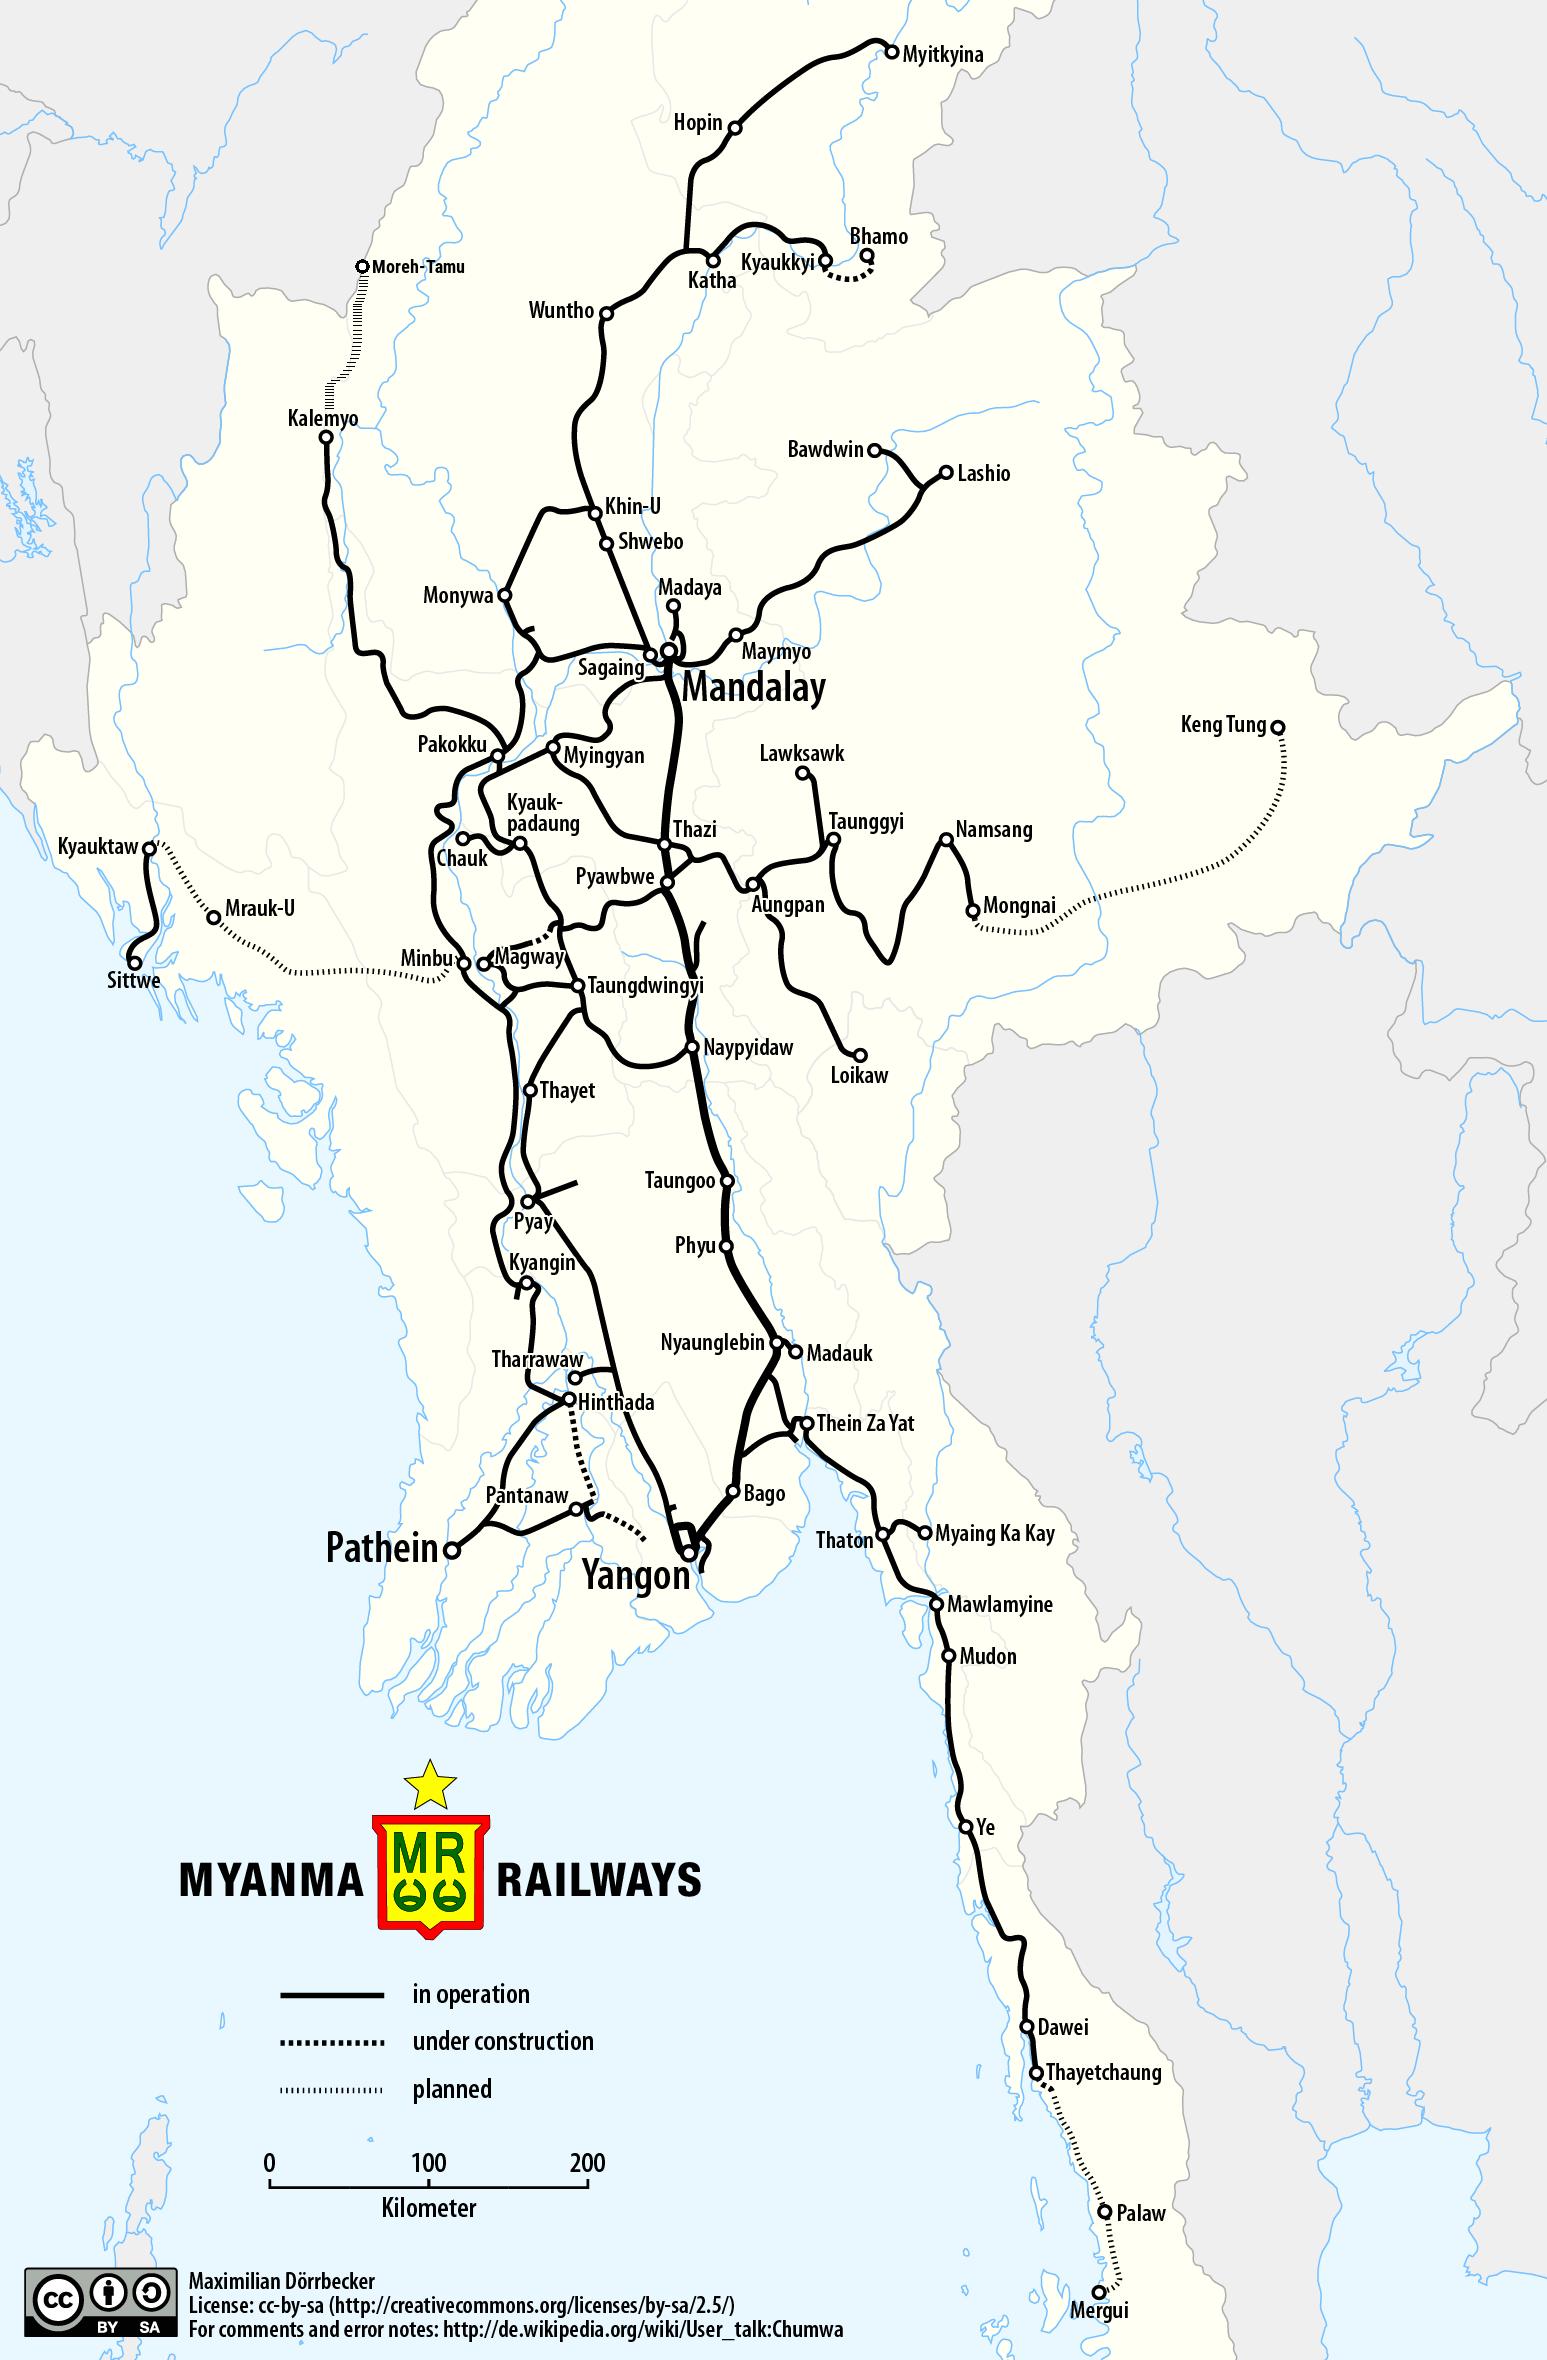 FileRailway map of Myanmarpng Wikimedia Commons